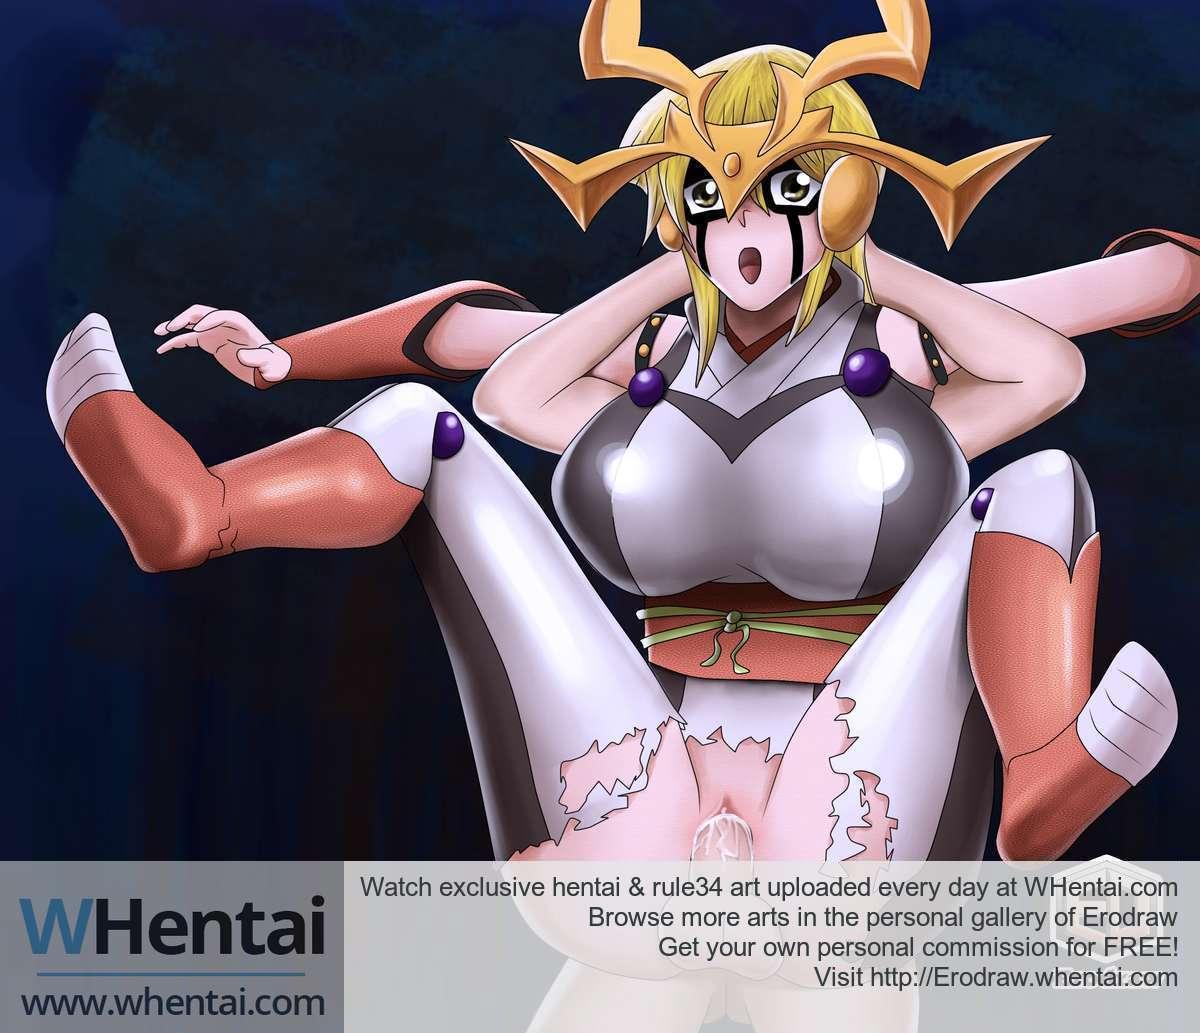 Asian erotic images